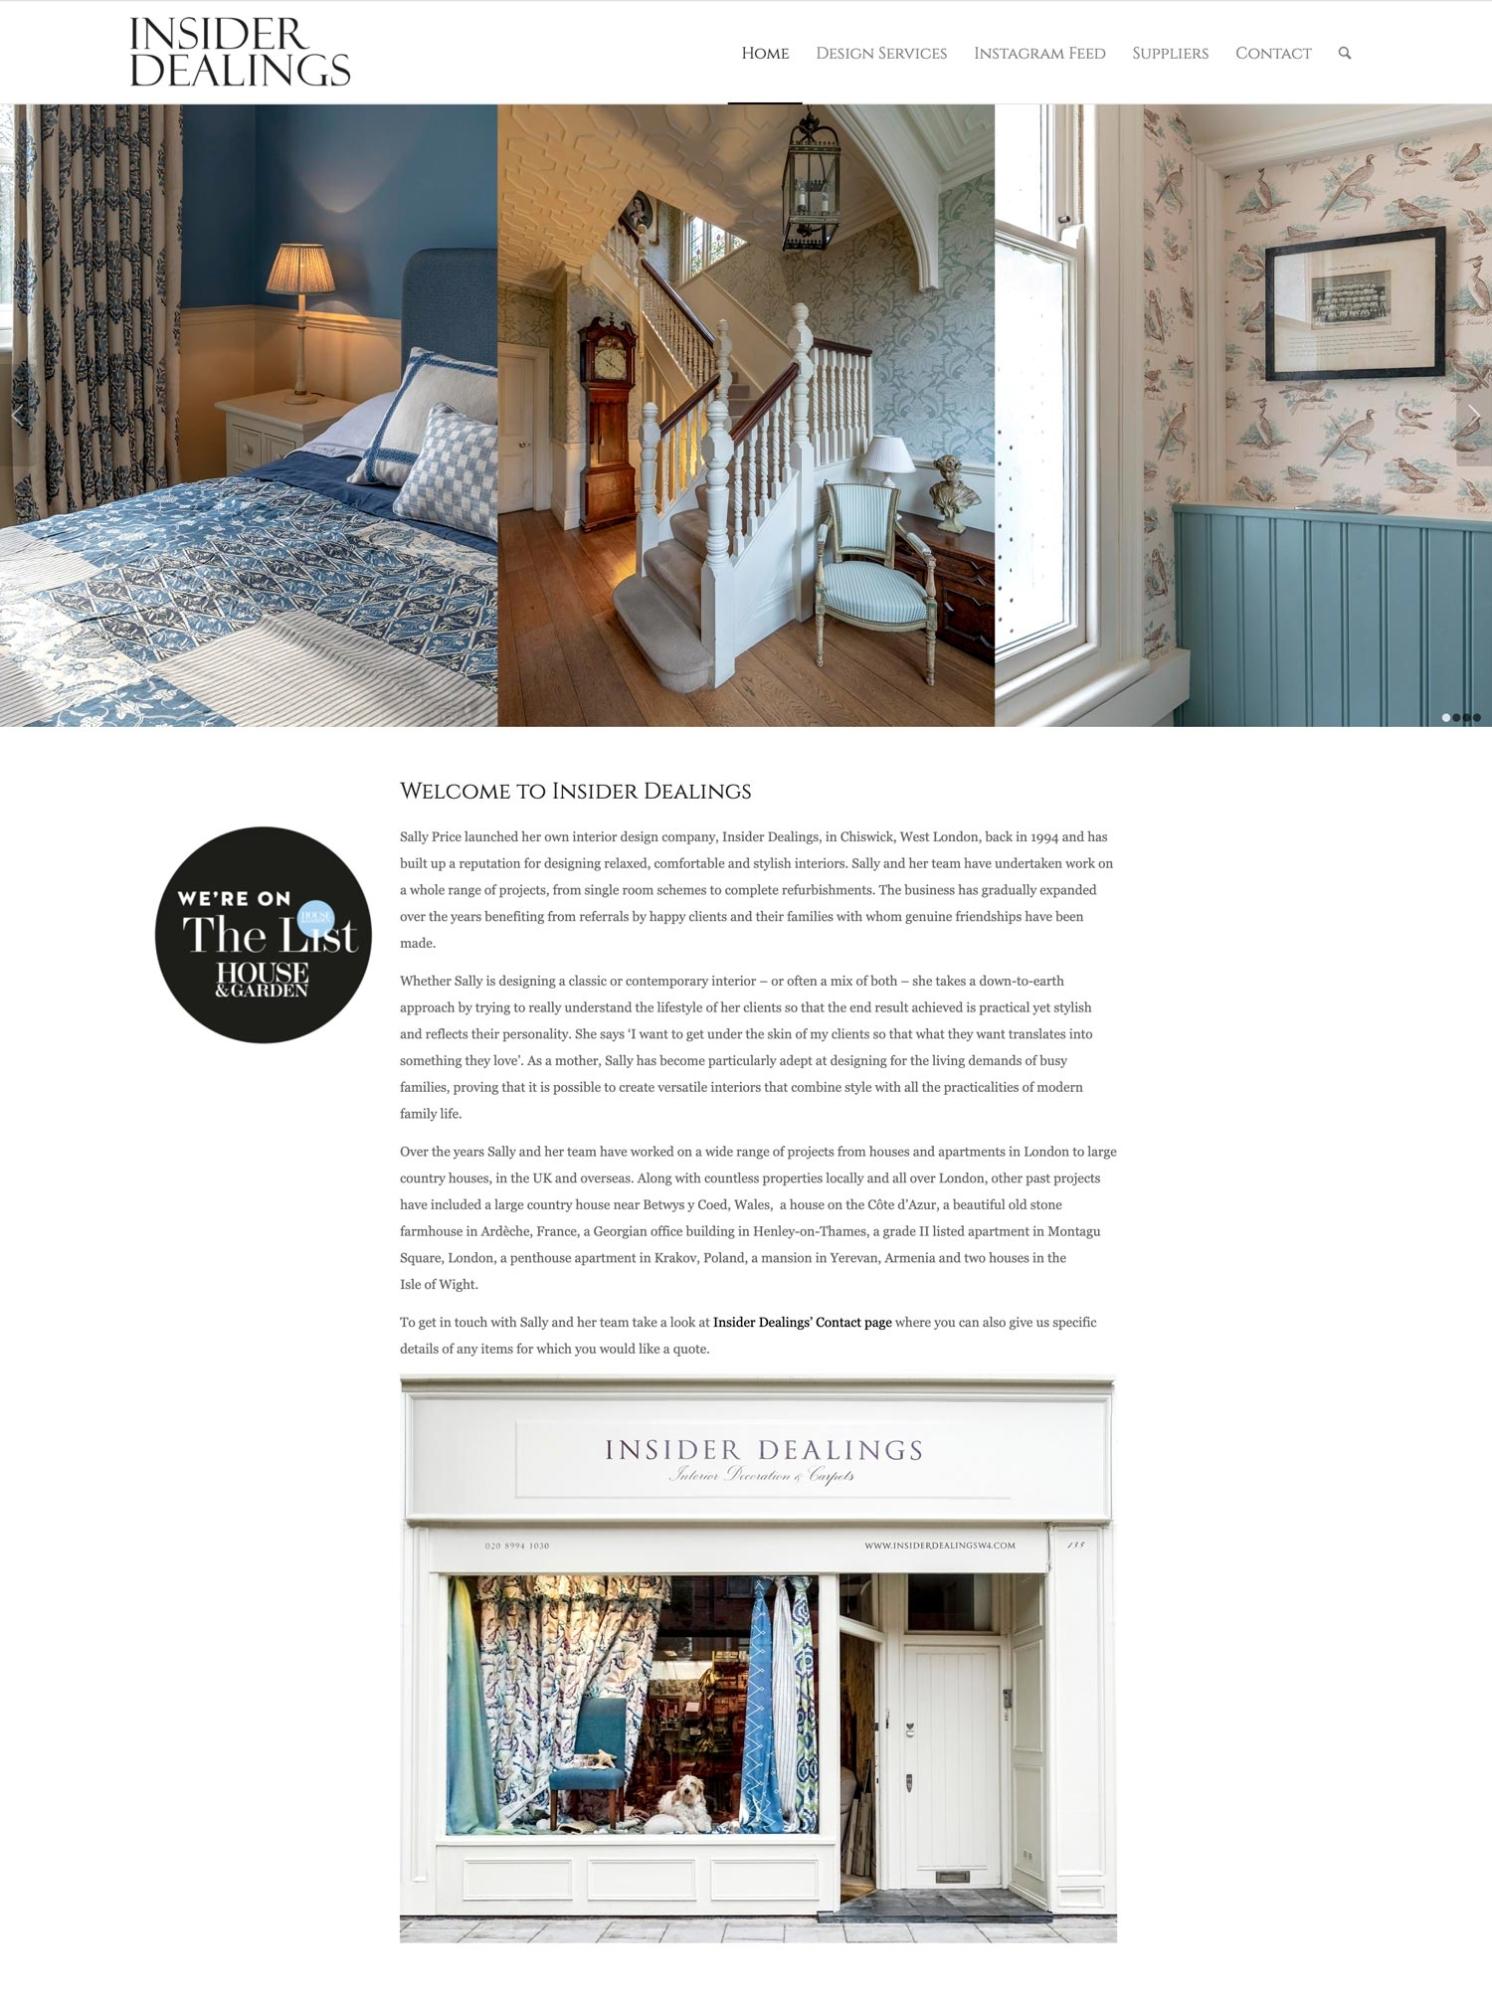 Insider Dealings Website Home 2